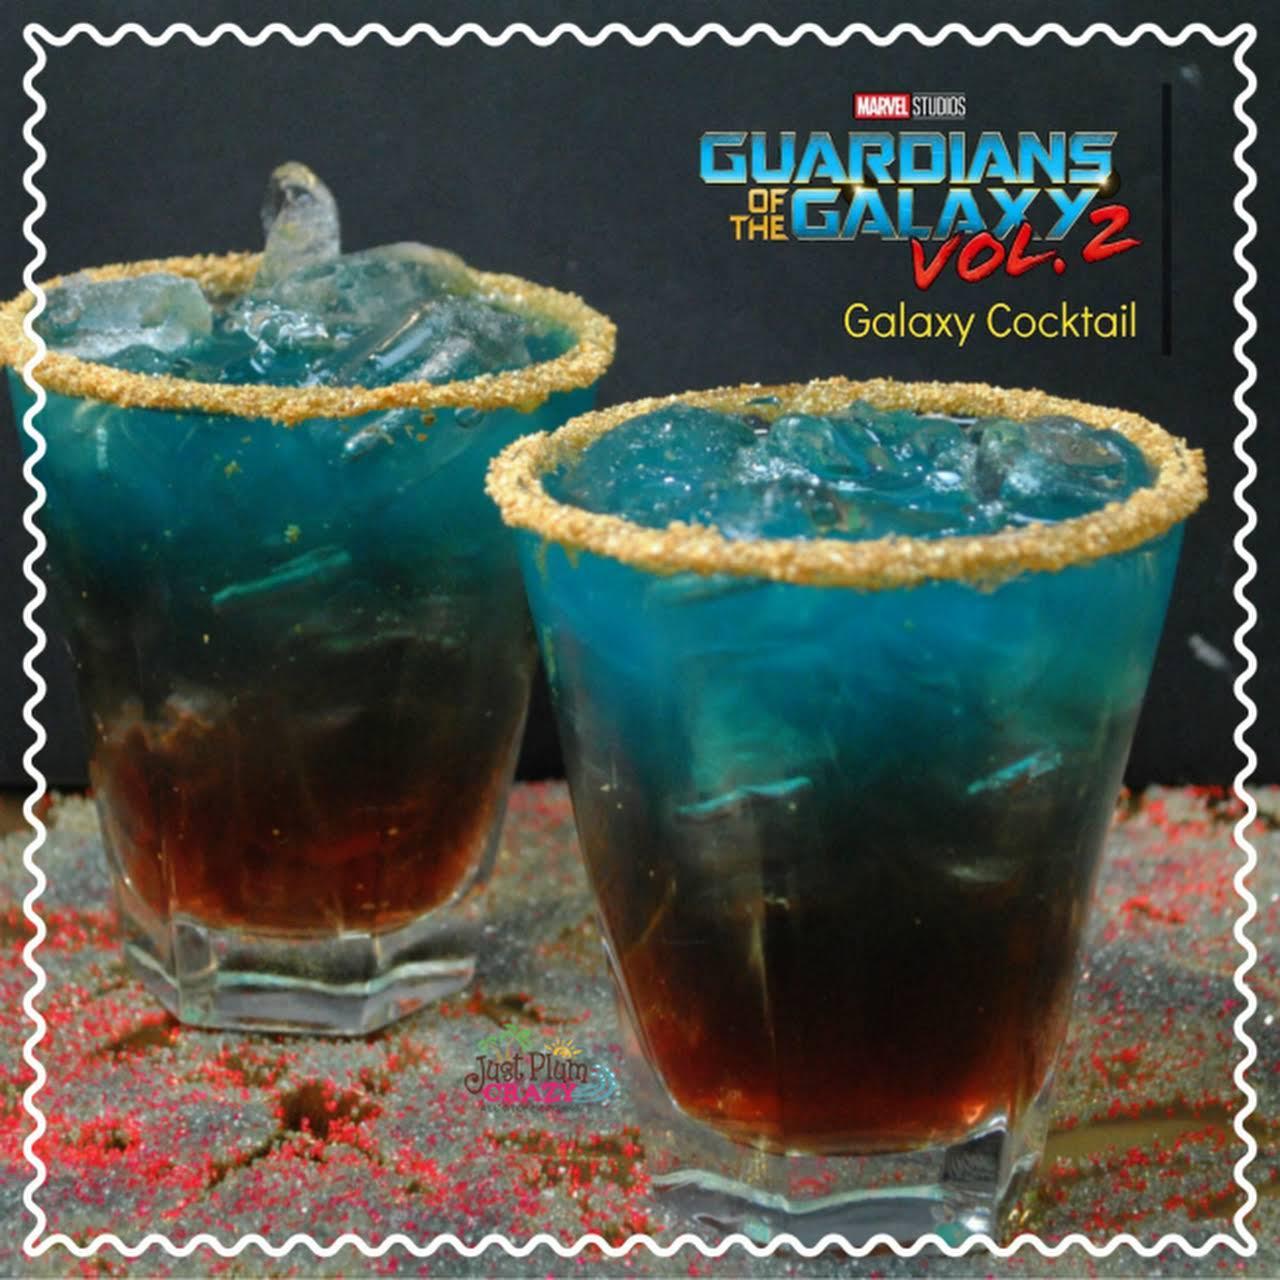 Guardians of the Galaxy Vol. 2 Galaxy Cocktail Recipe #GotGVol2